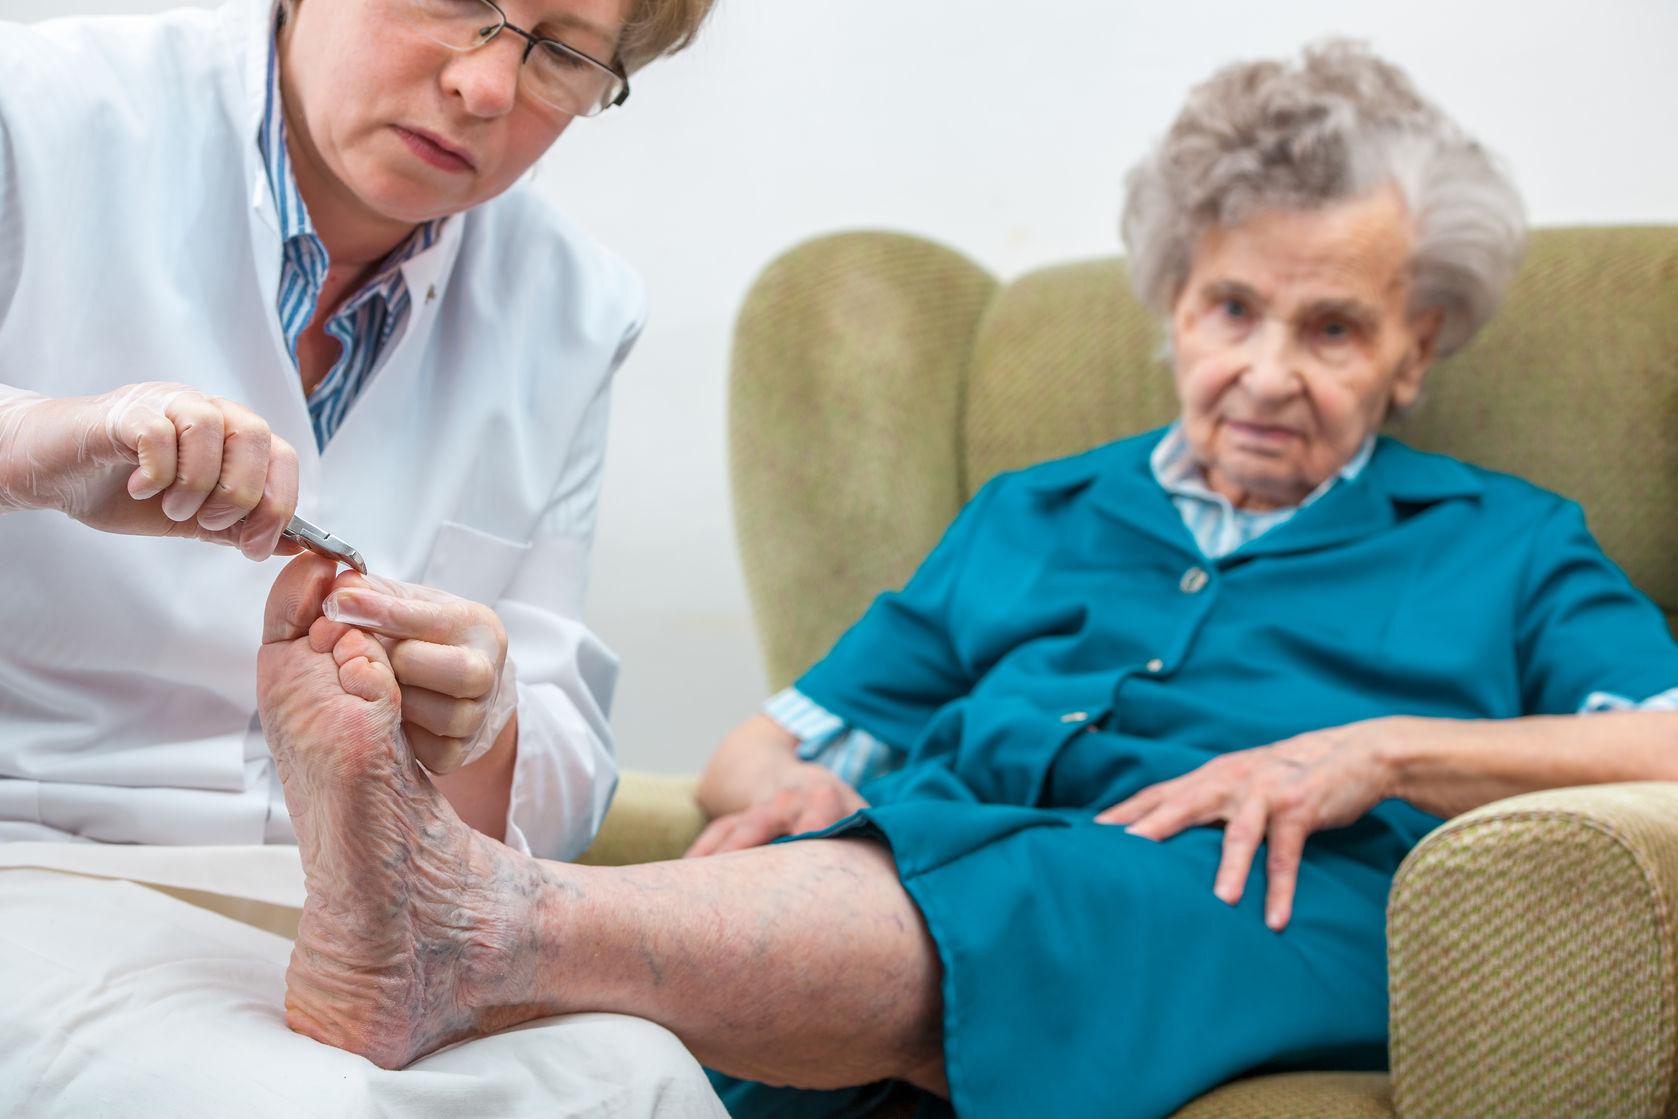 30402737_L_Senior_toenails_clipping_podiatrist_woman_diabetes.jpg